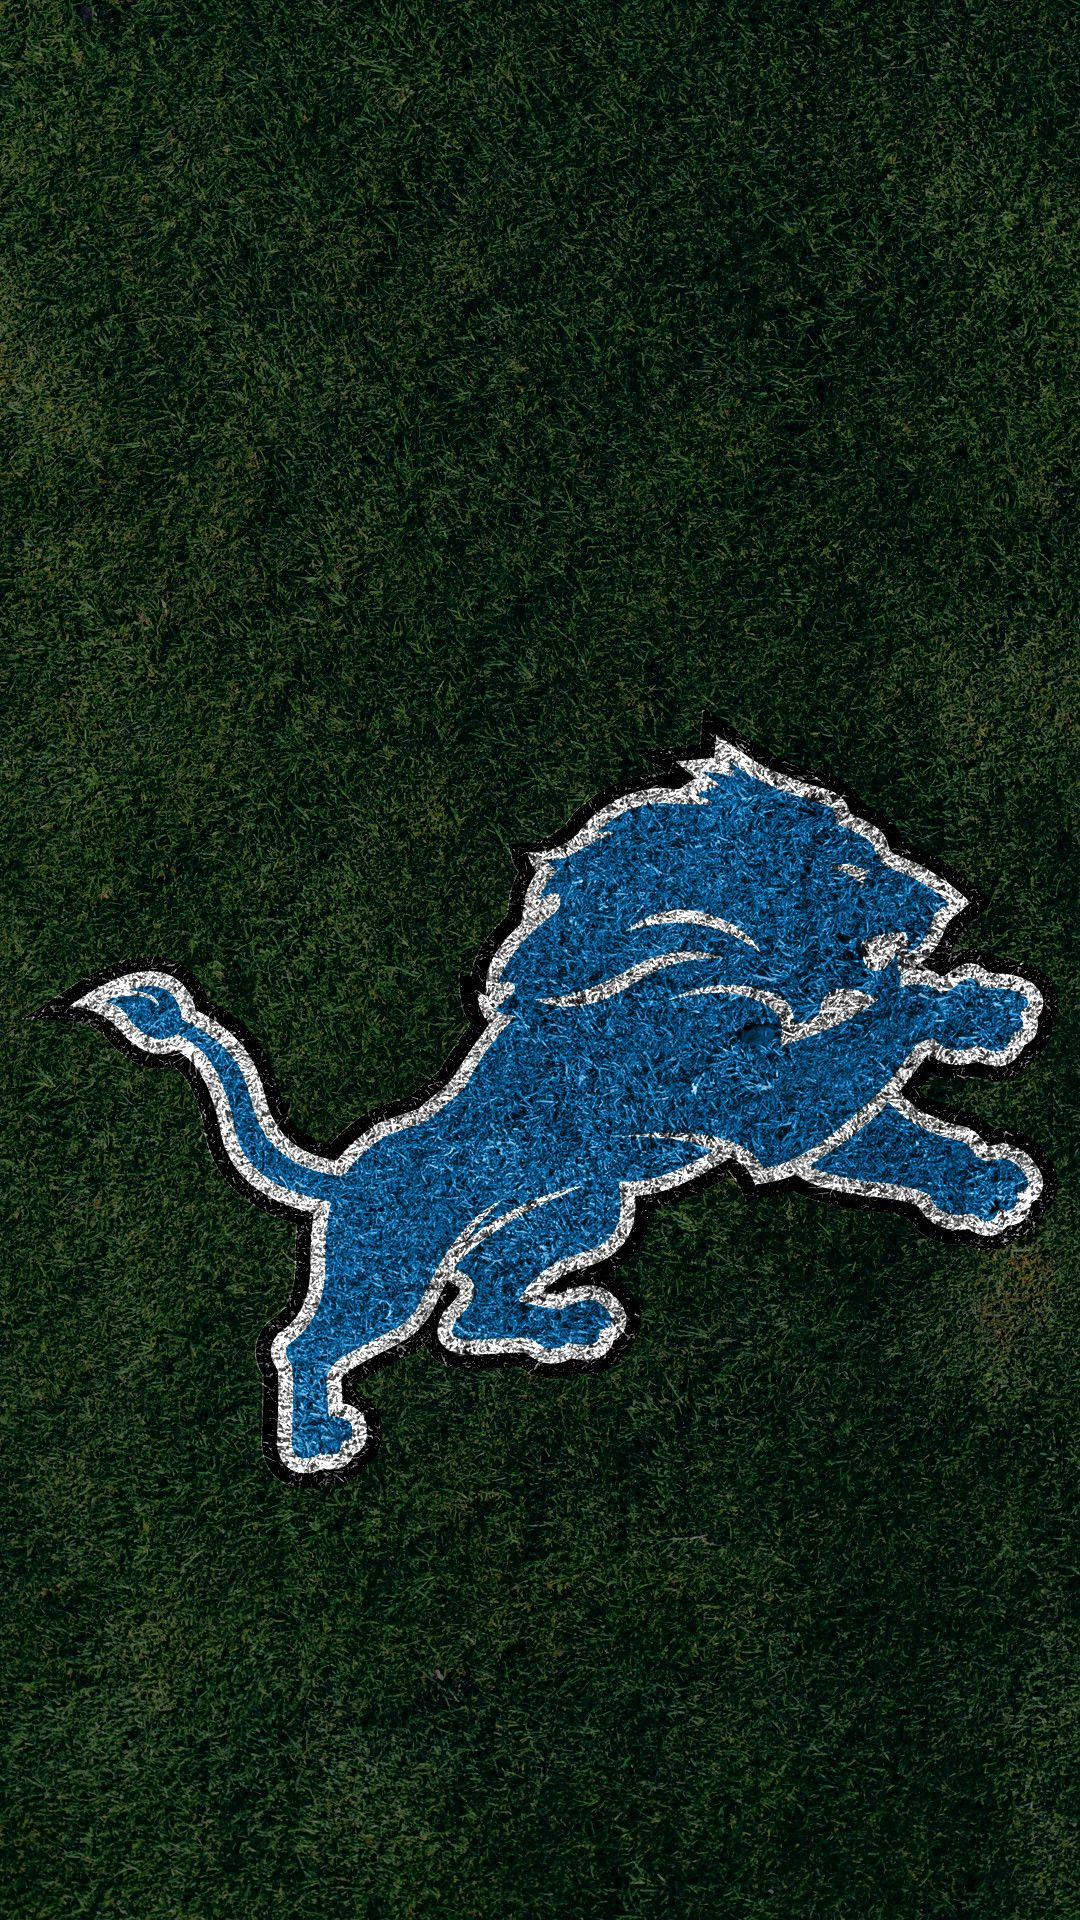 Detroit Lions Wallpaper D Hd Wallpaper Blue Wallpaper